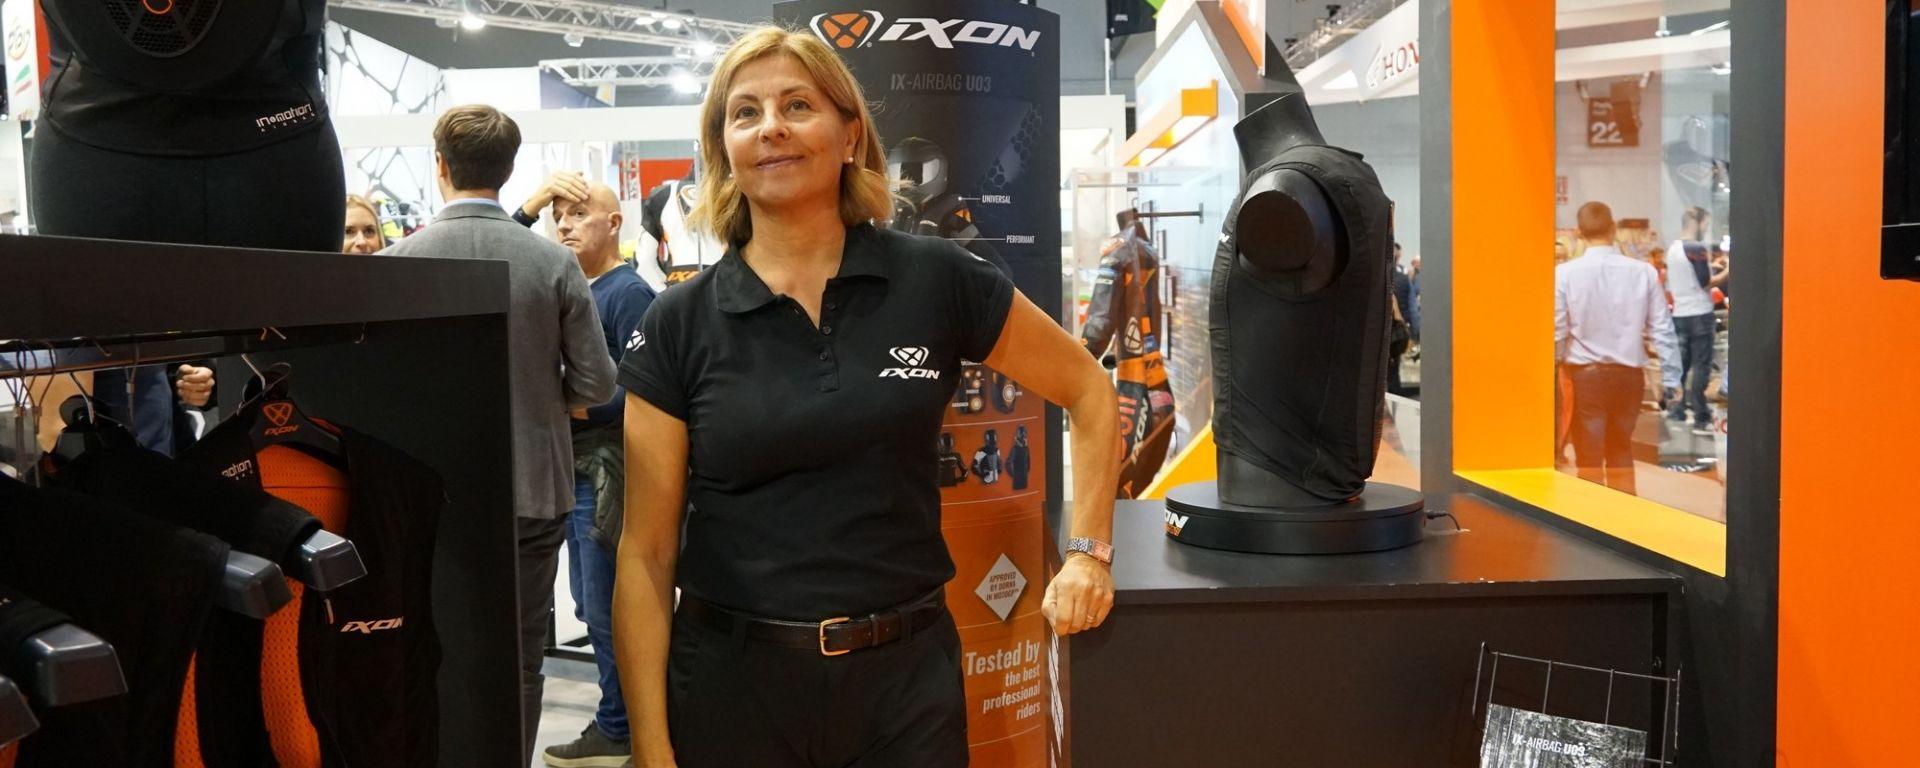 IX-Airbag U03: a Eicma l'airbag elettronico per la giacca moto